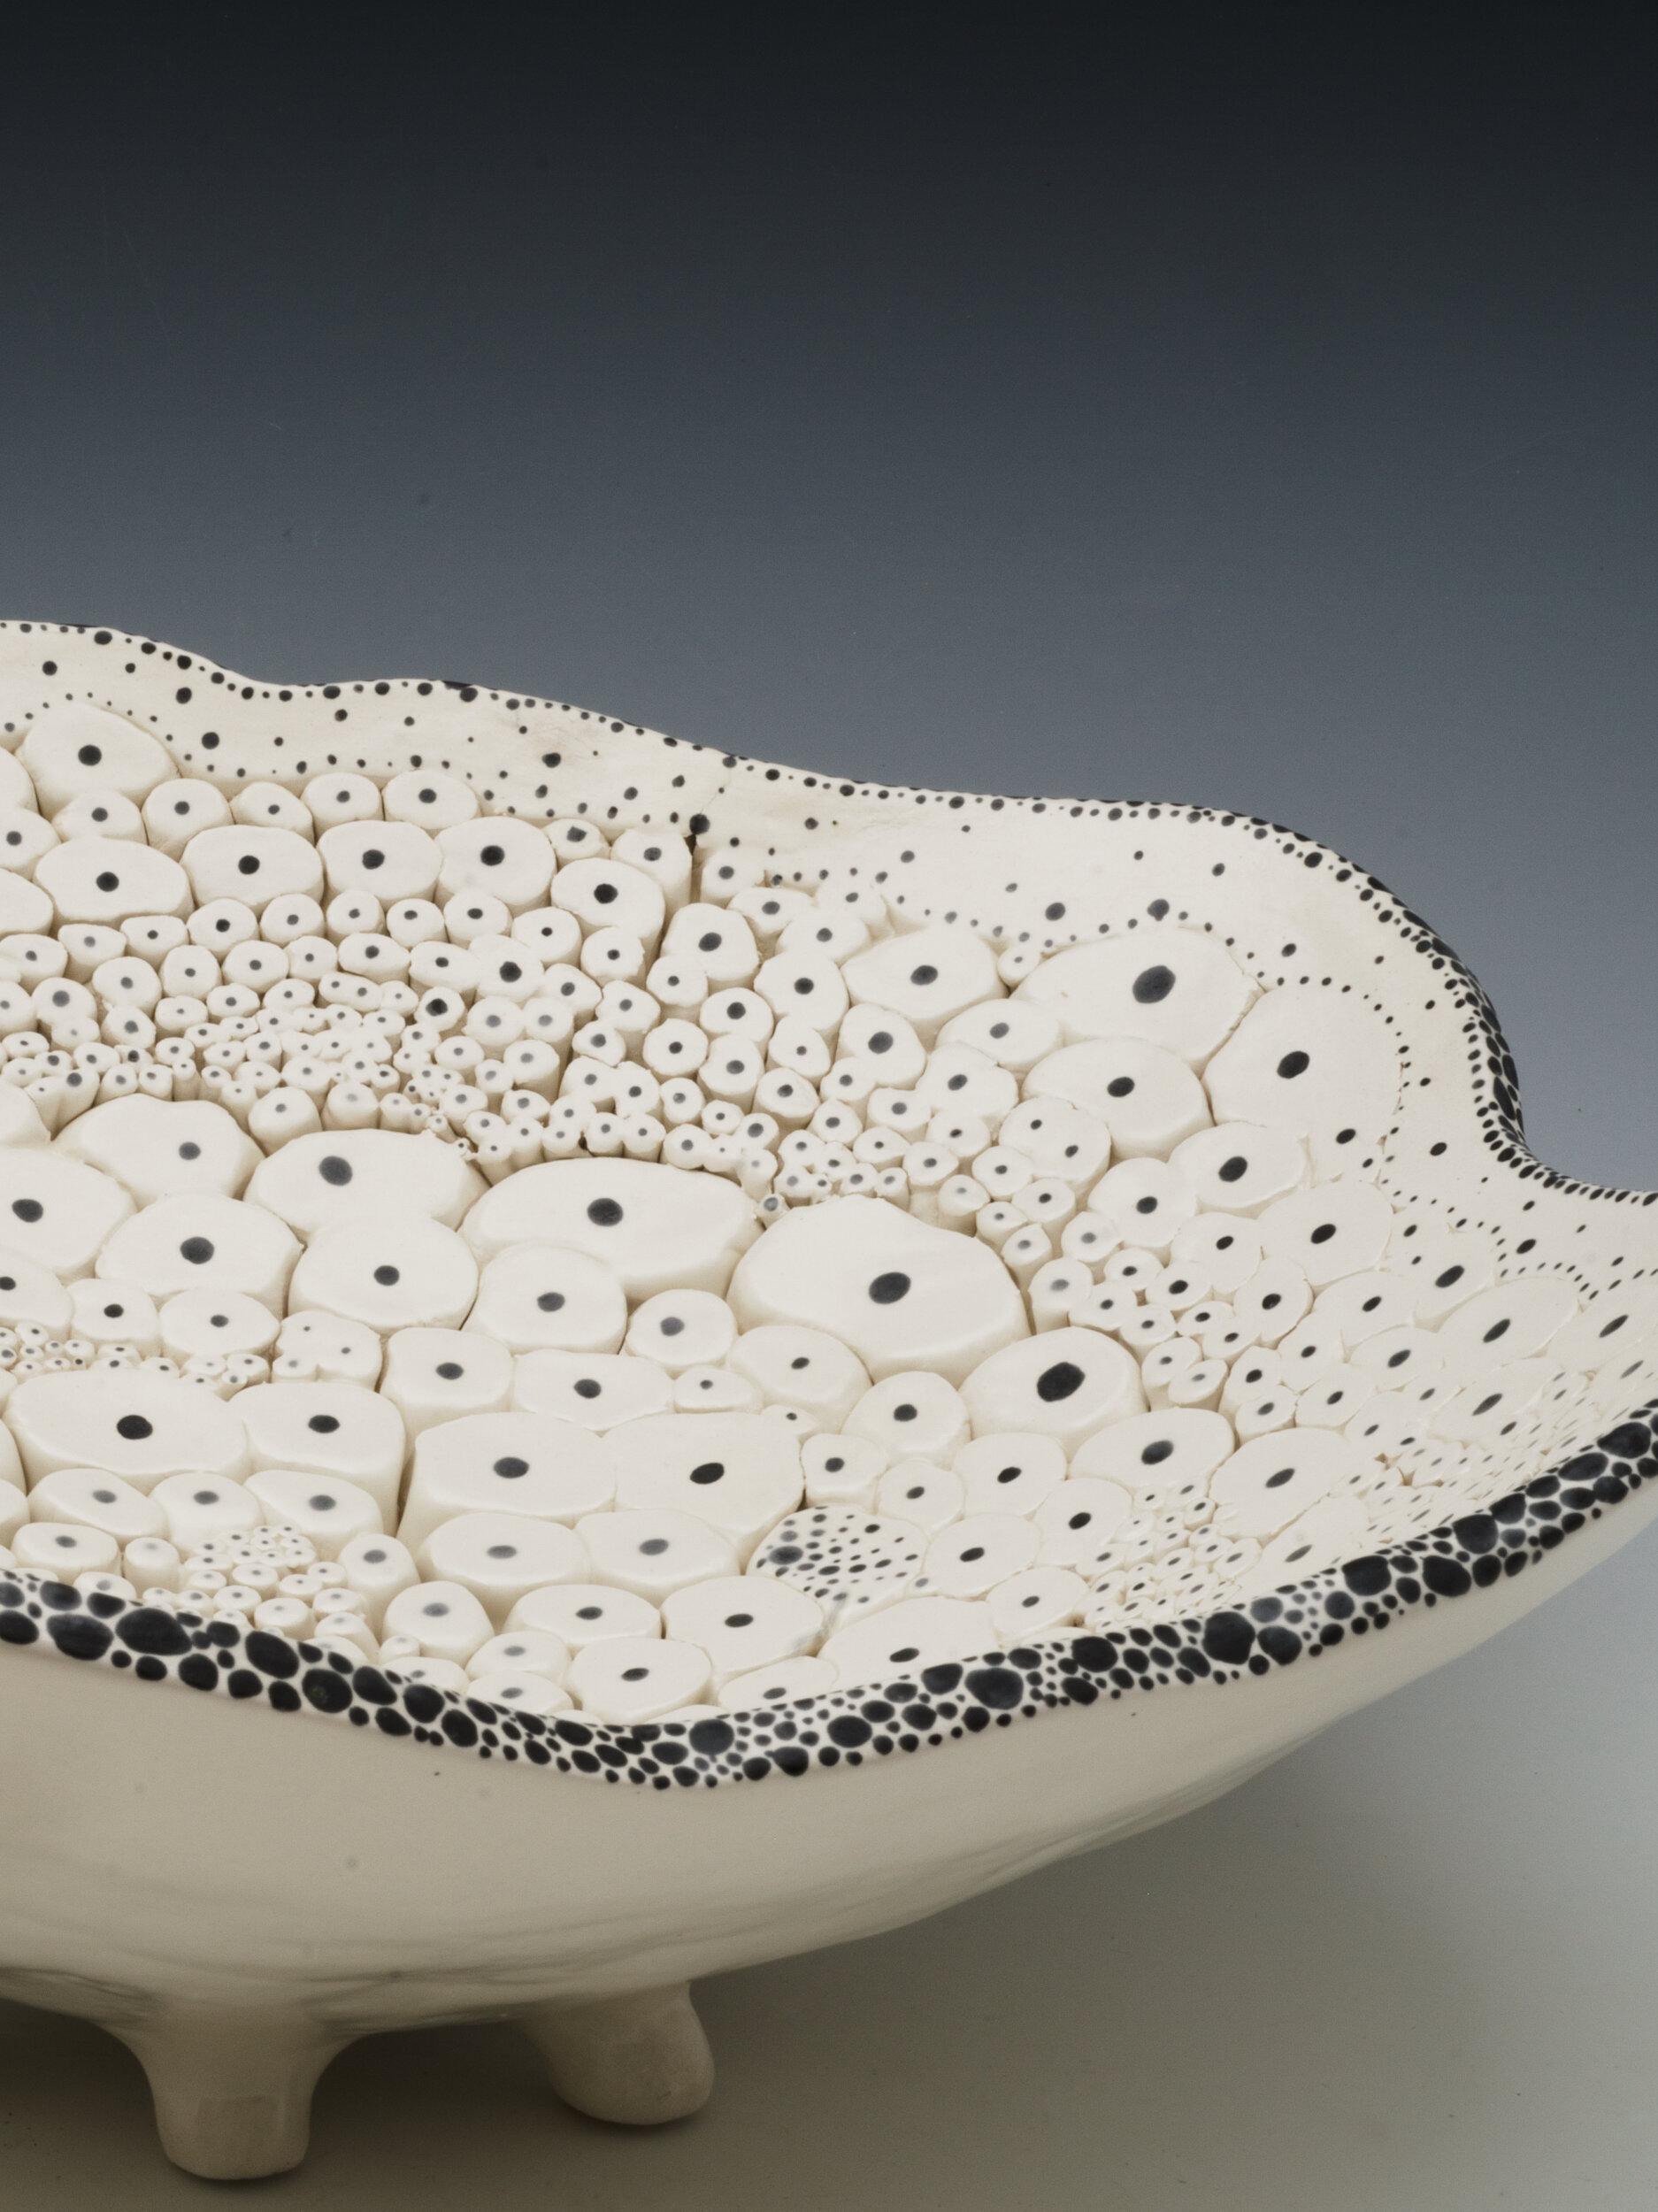 Coral Bowl Detail